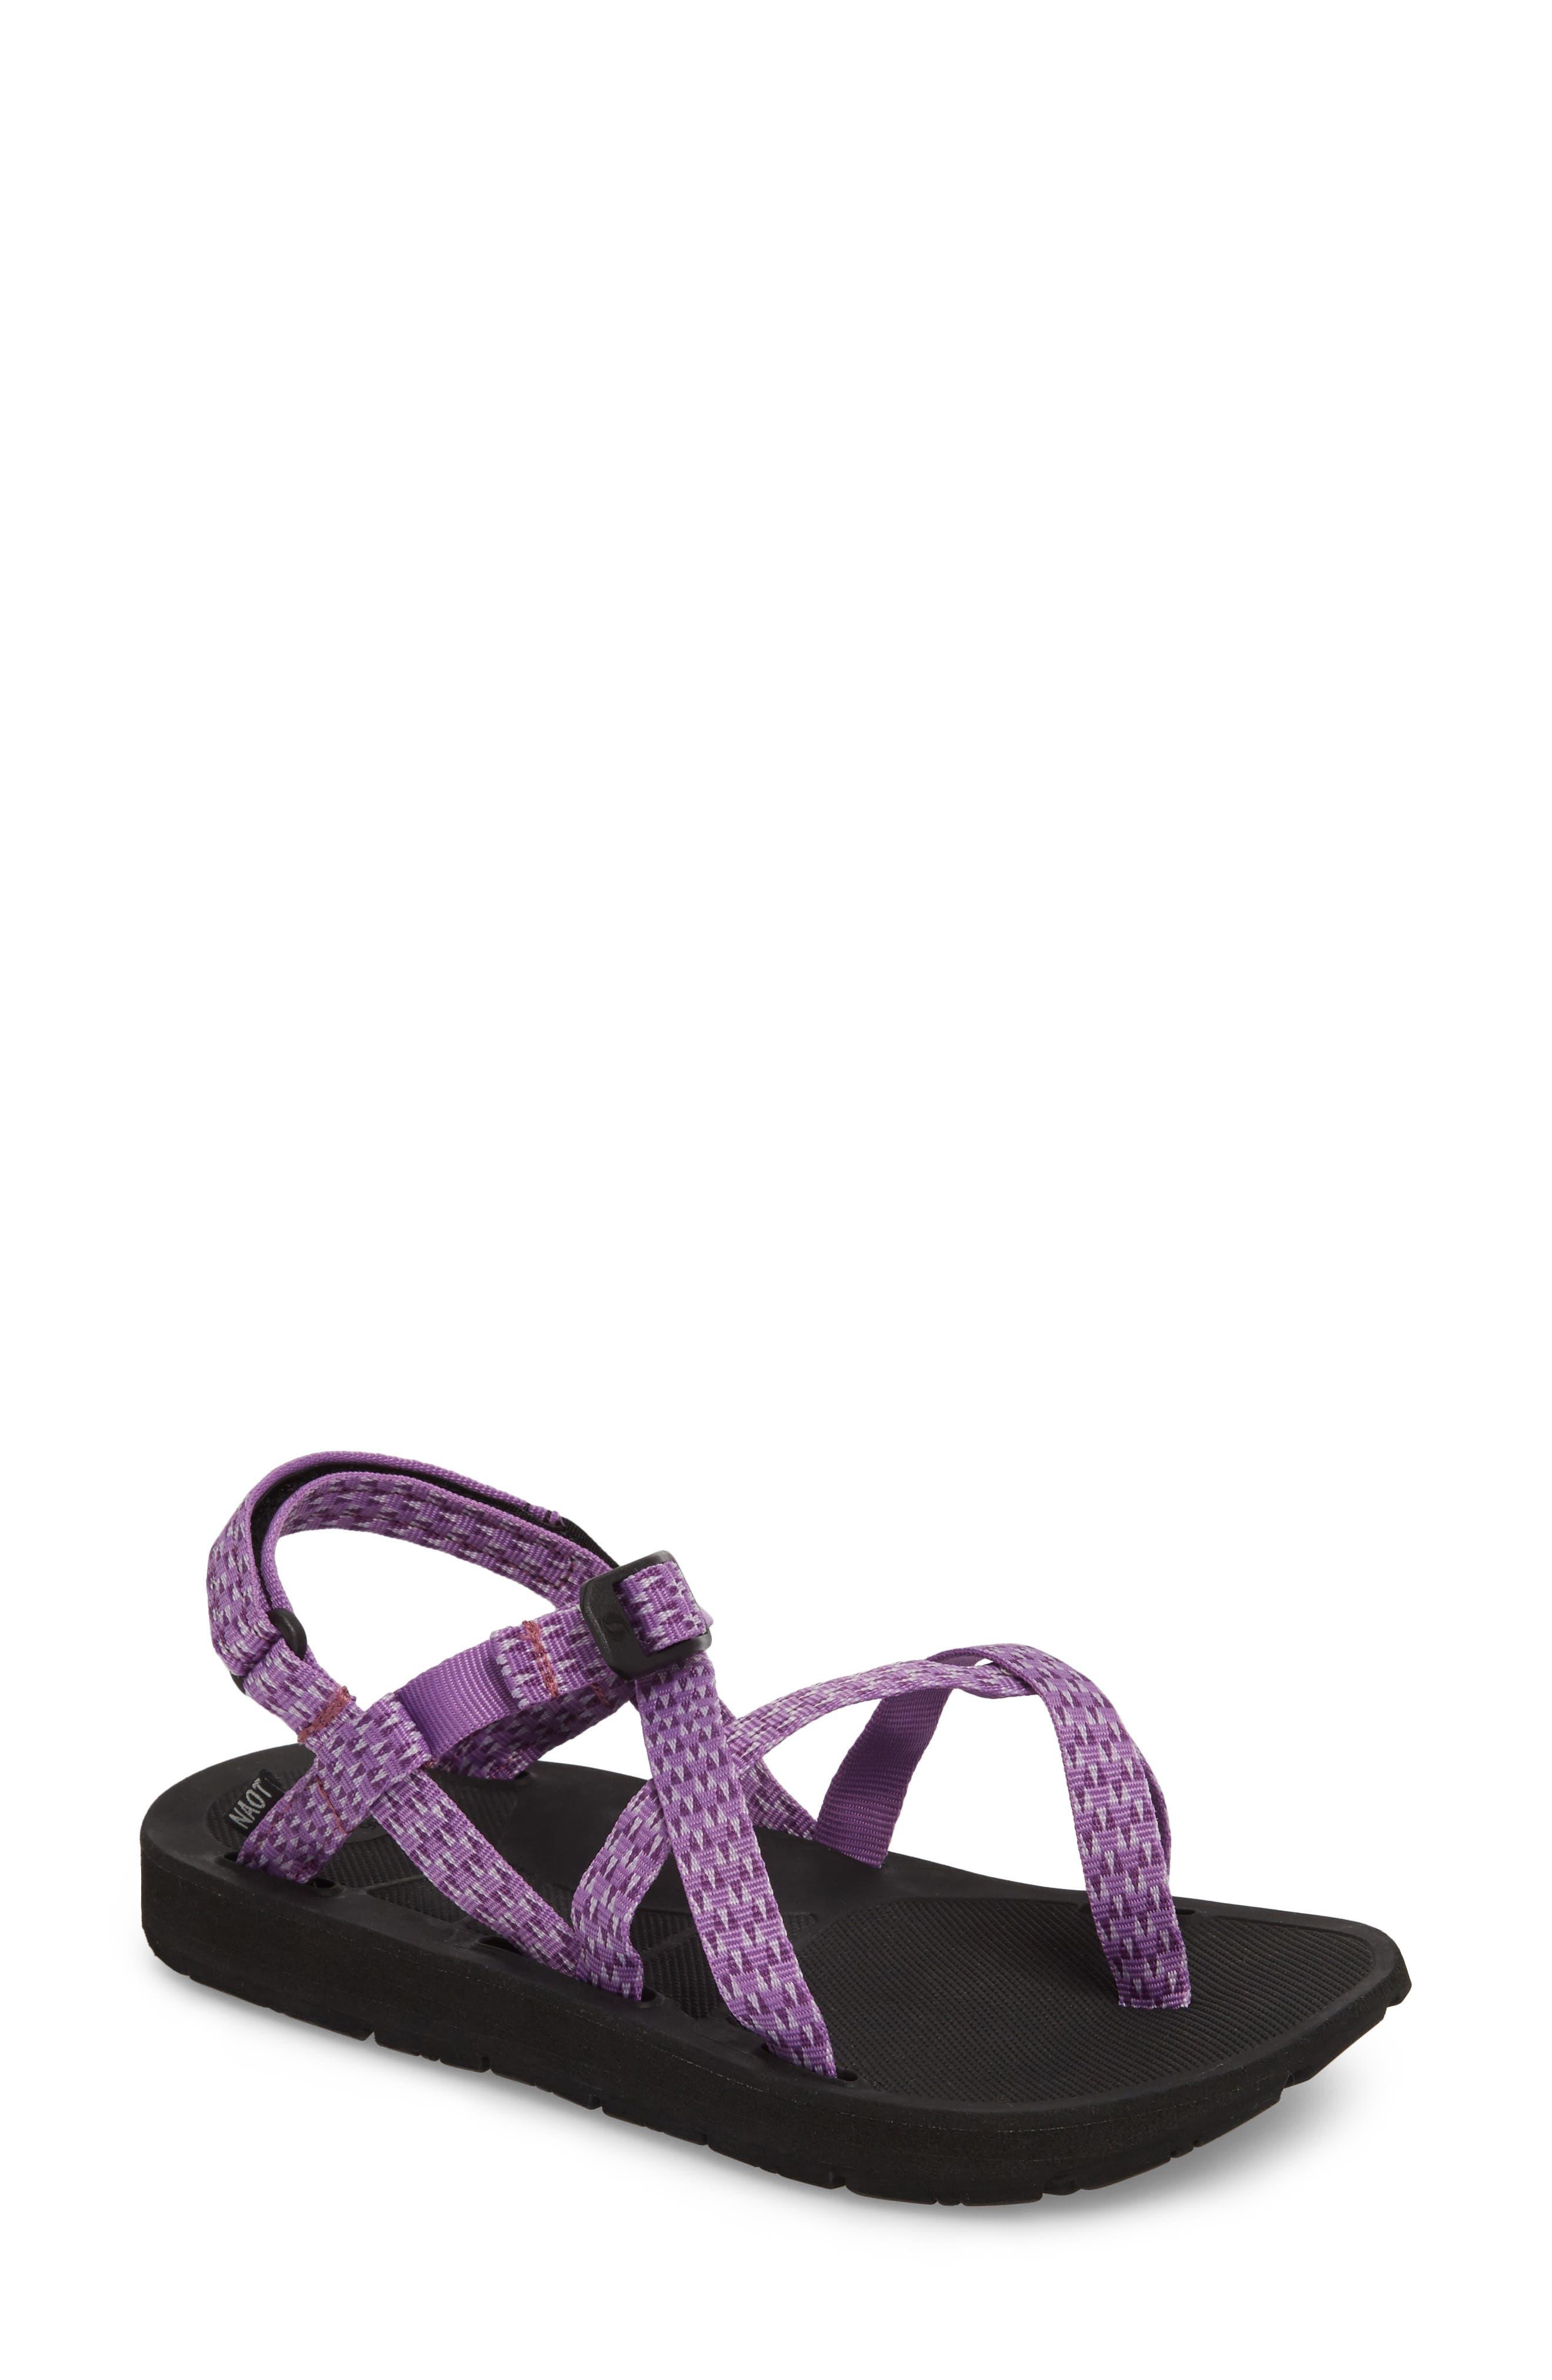 Shore Sandal,                         Main,                         color, Purple Triangles Fabric